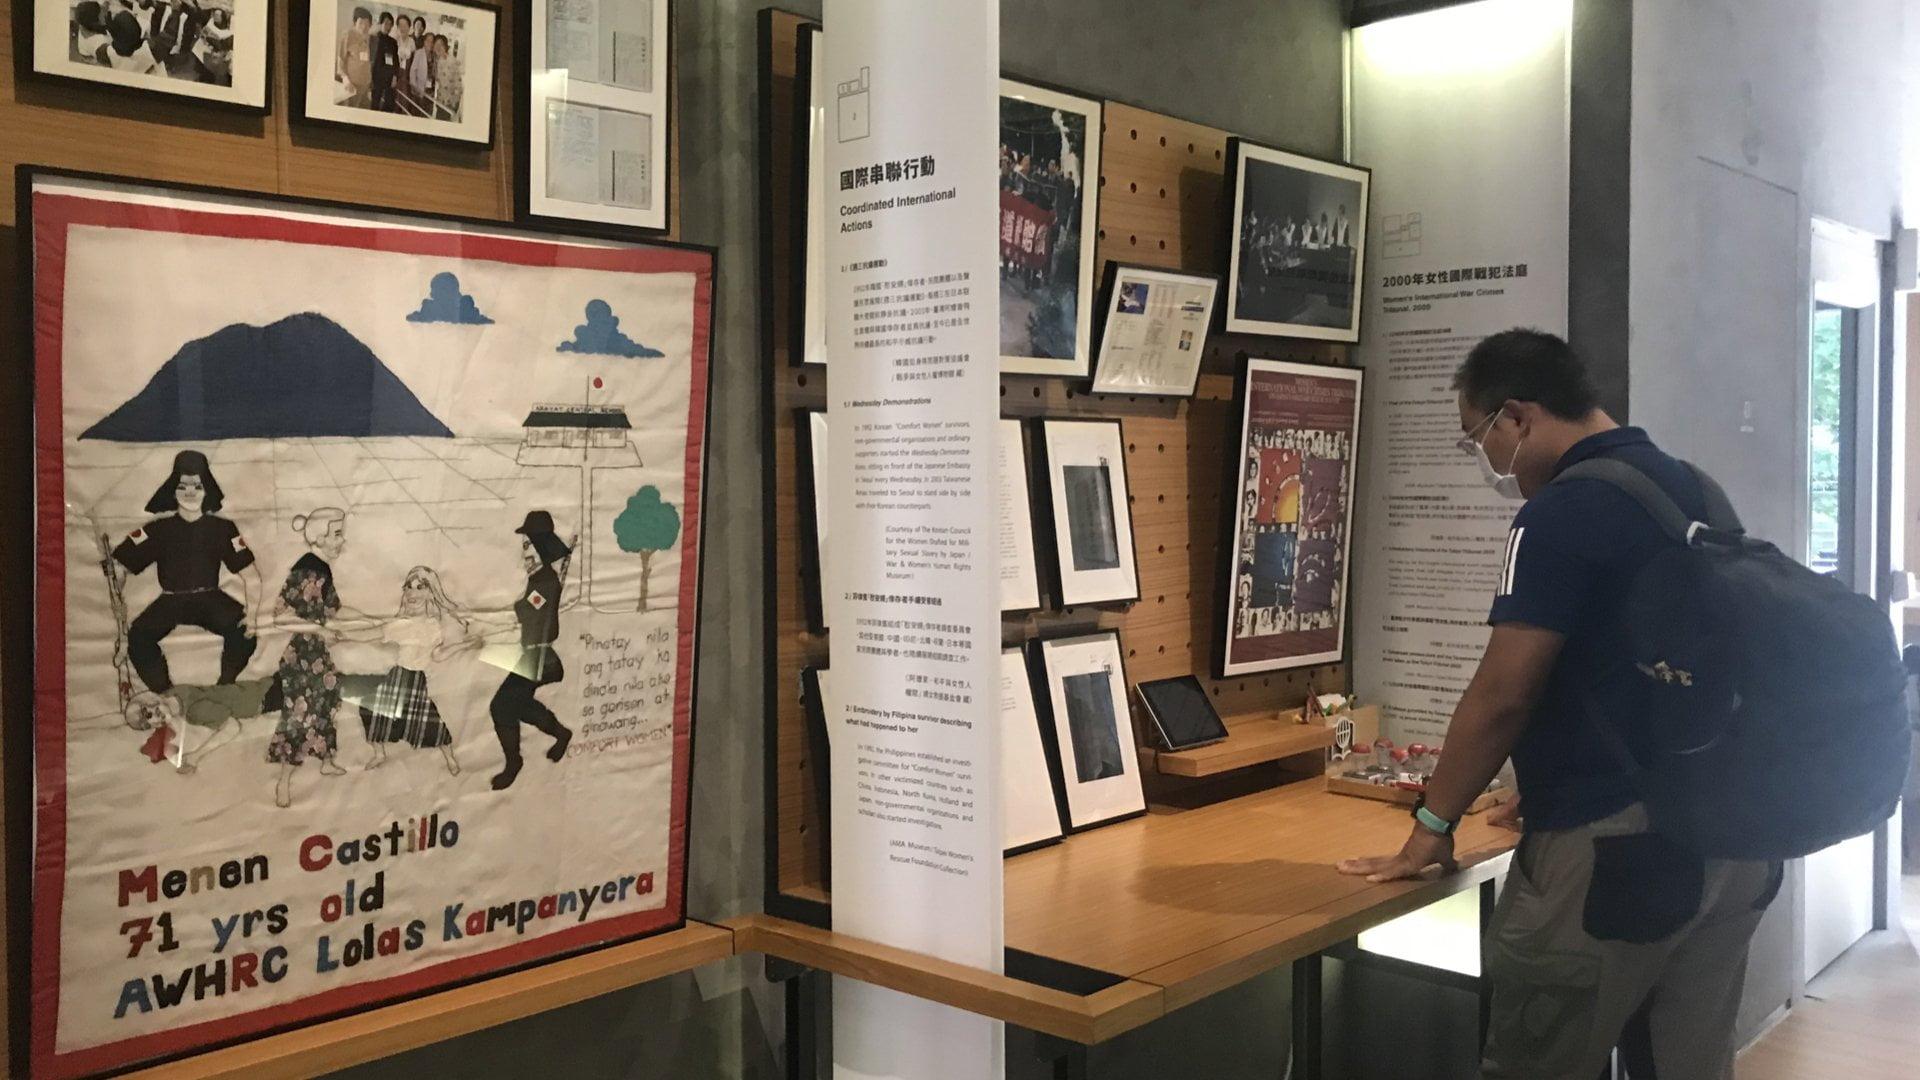 Ama Museum 1606232625 - Taiwan's Comfort Women Museum Closes Its Doors